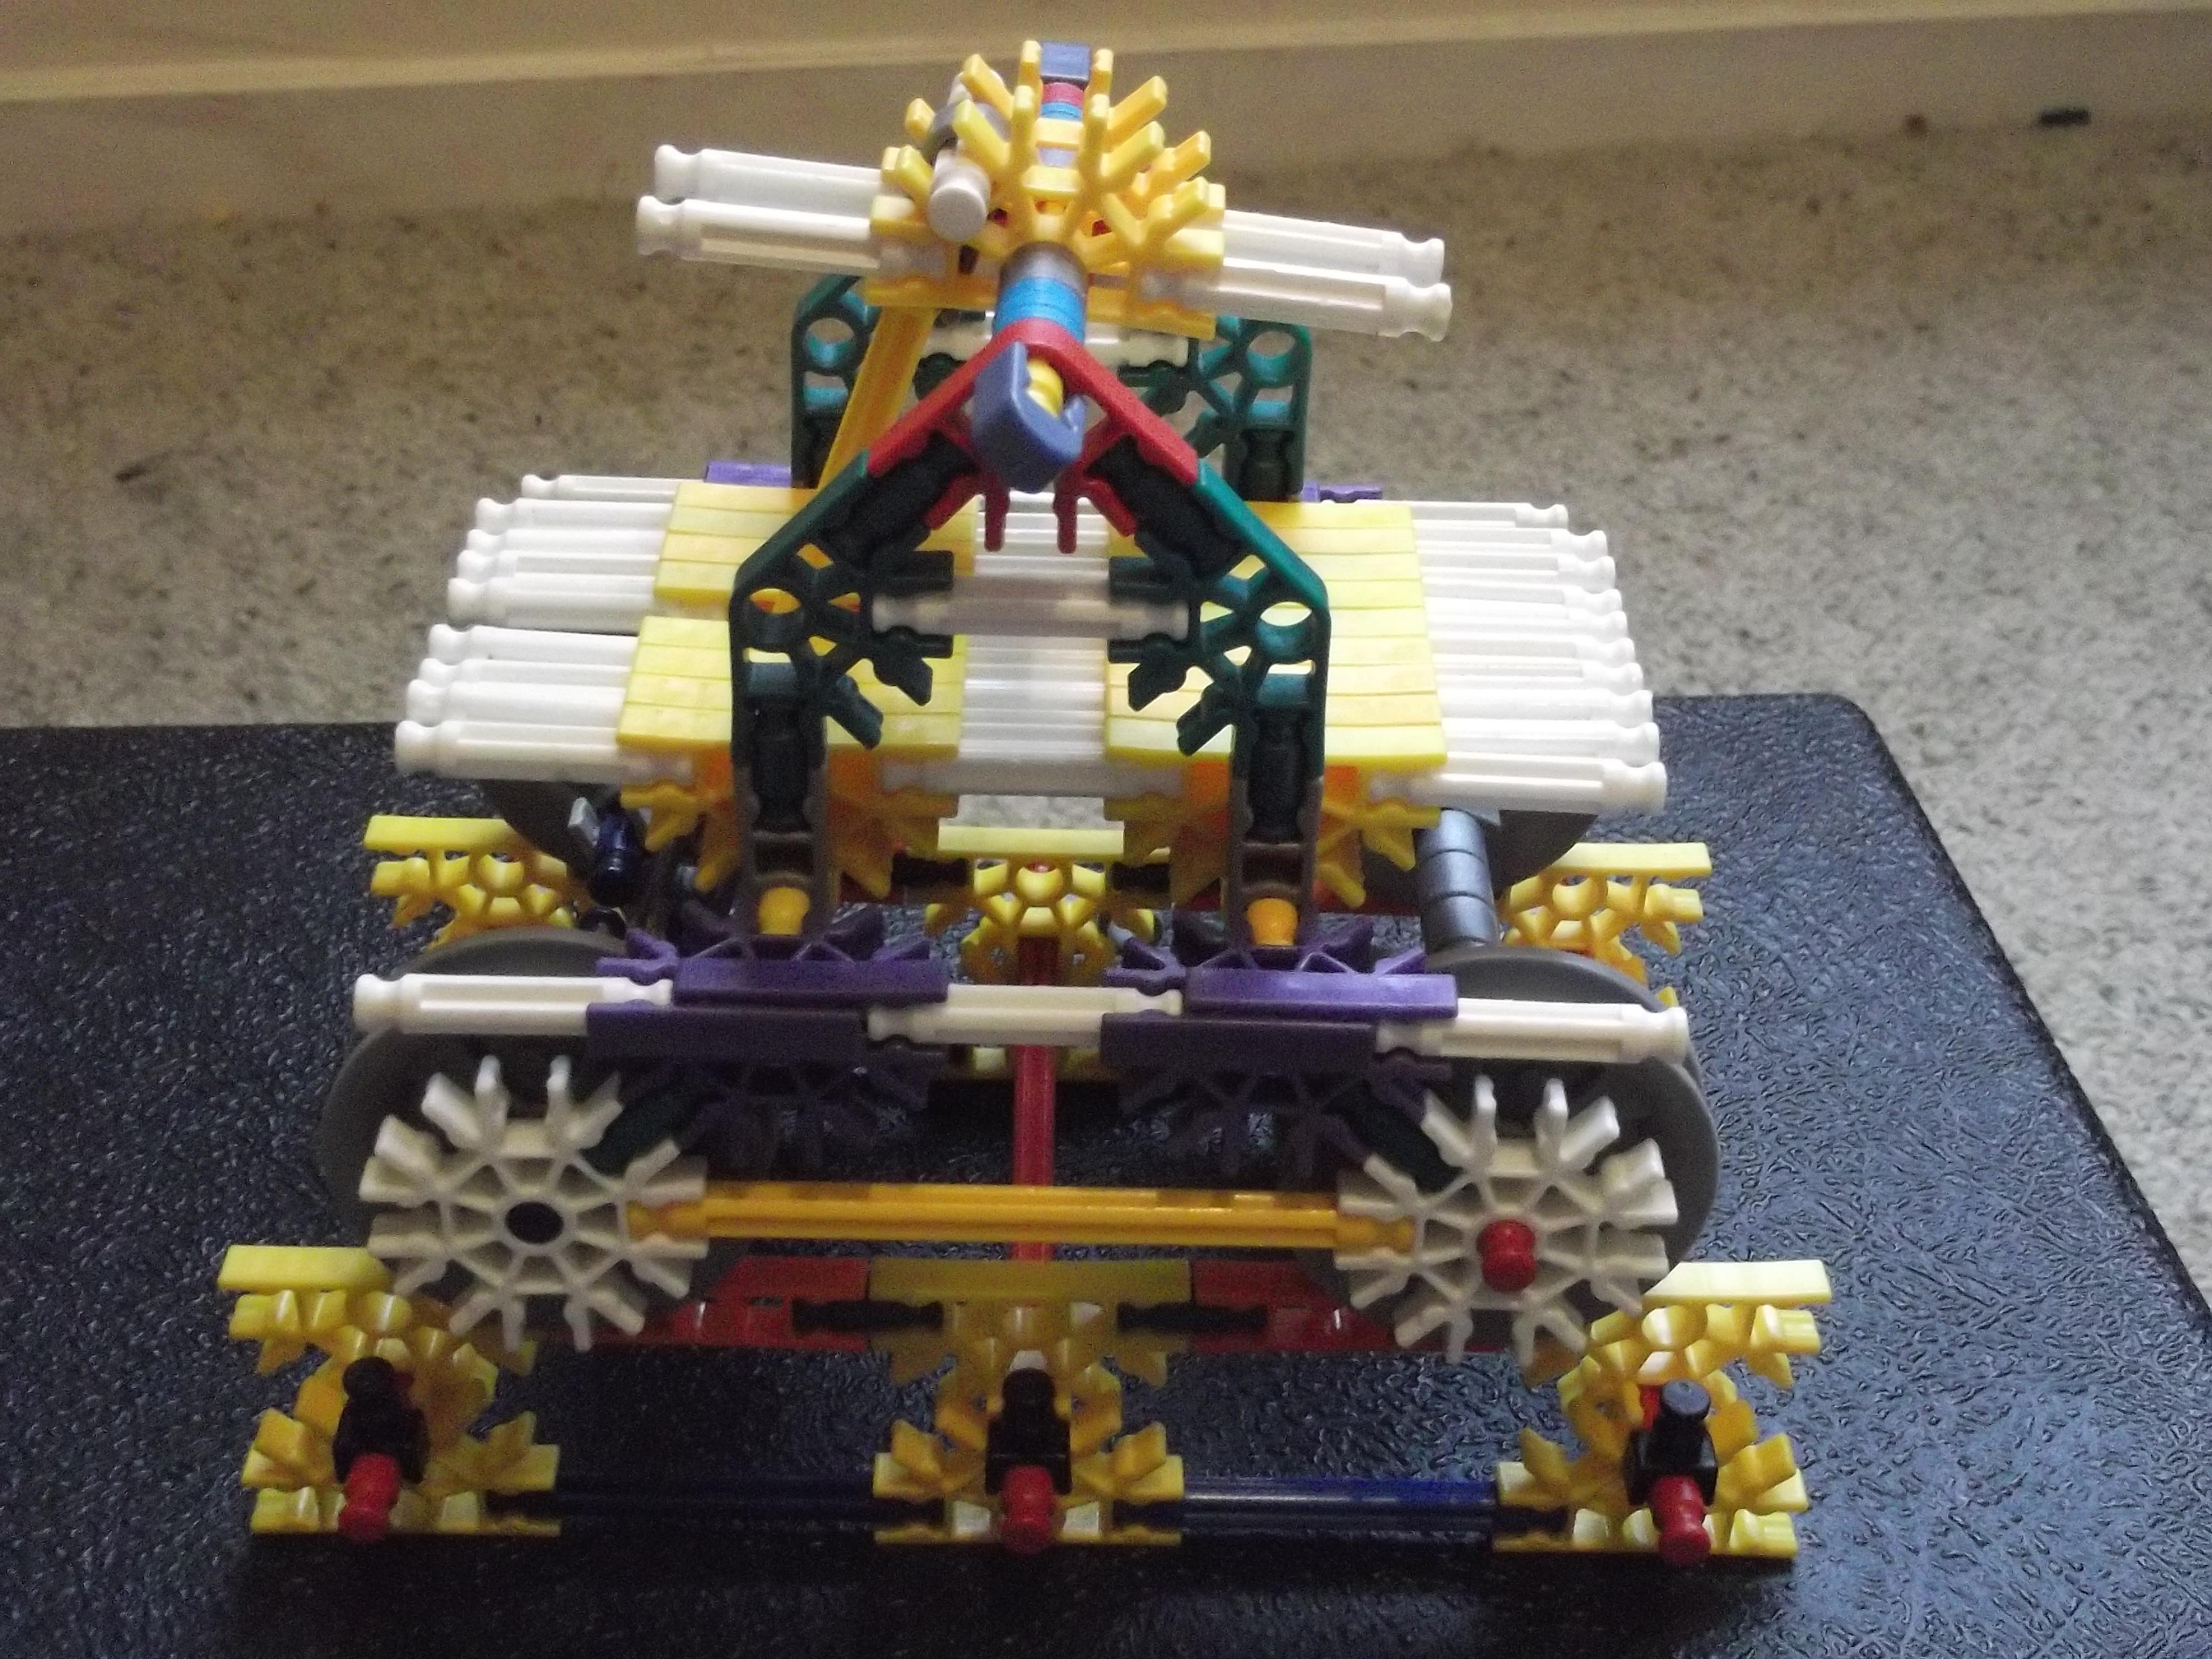 Knex Rail Car and Track